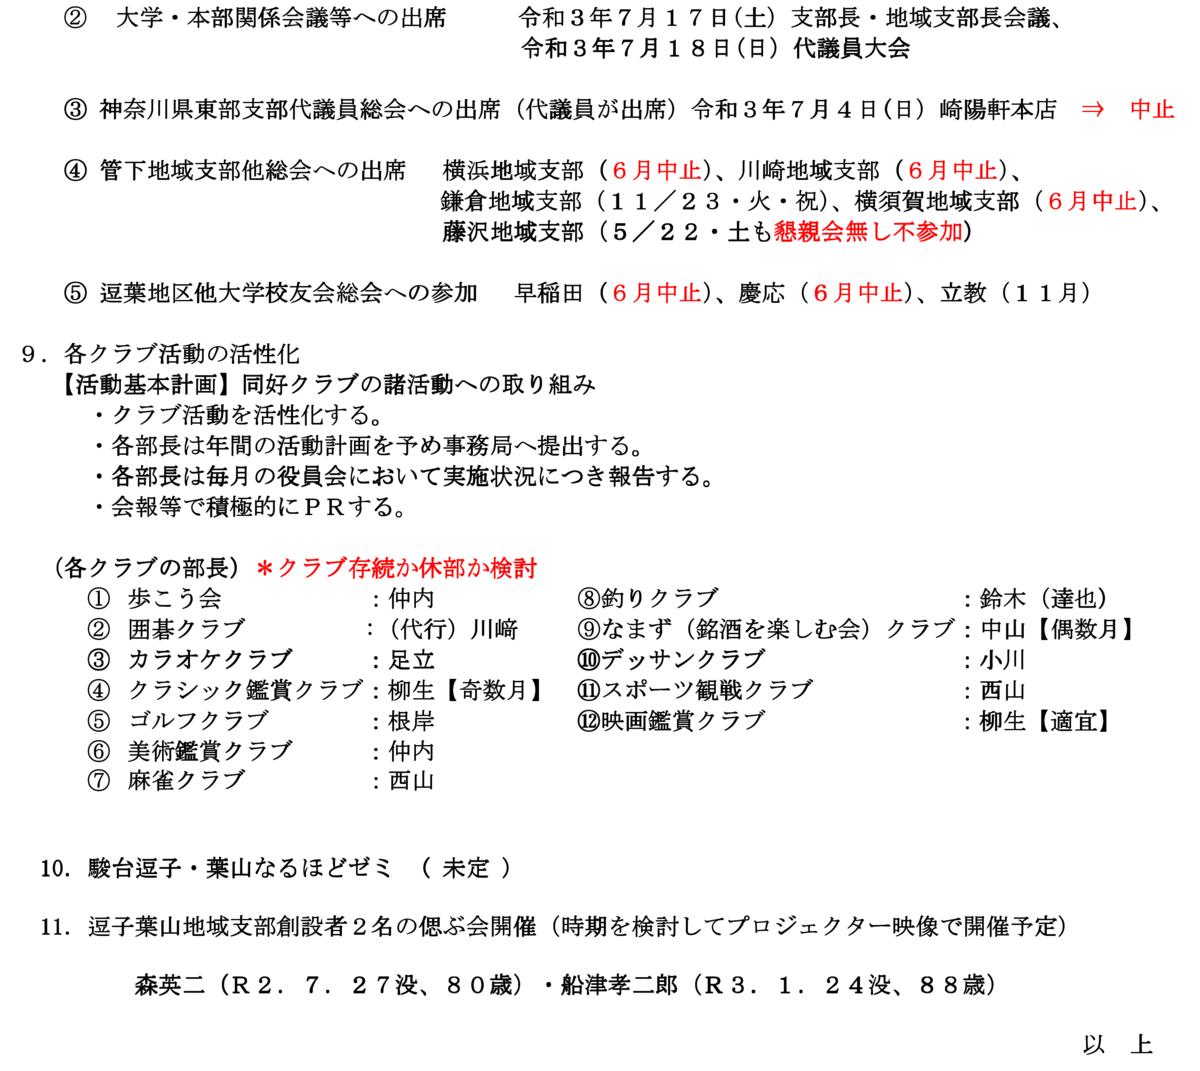 f:id:meijizuyou:20210613135701p:plain